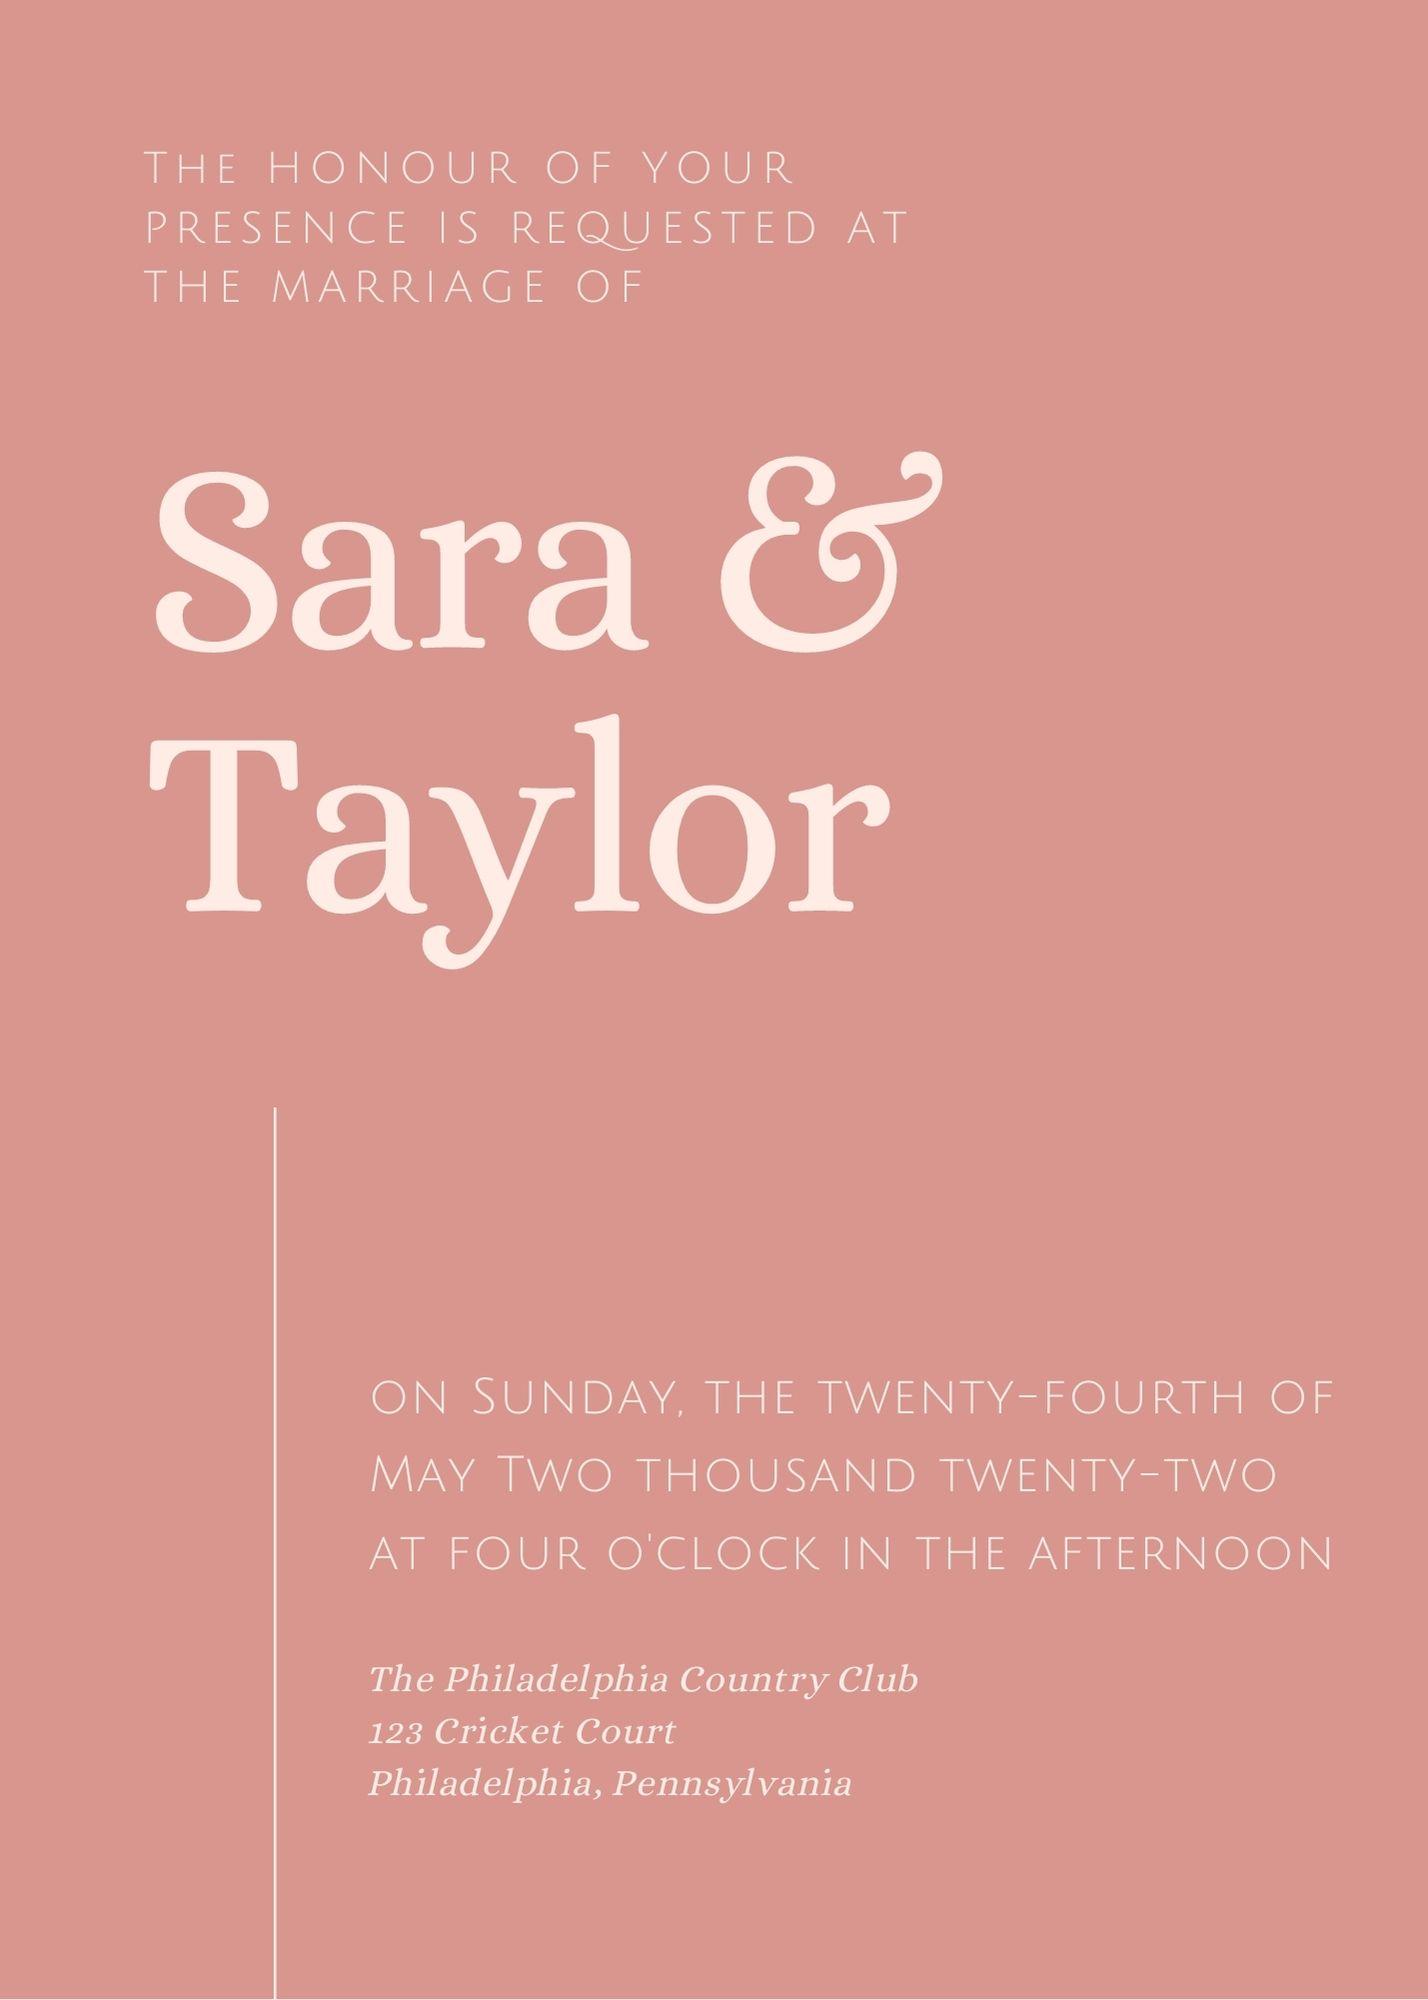 wedding invitation with no designated host